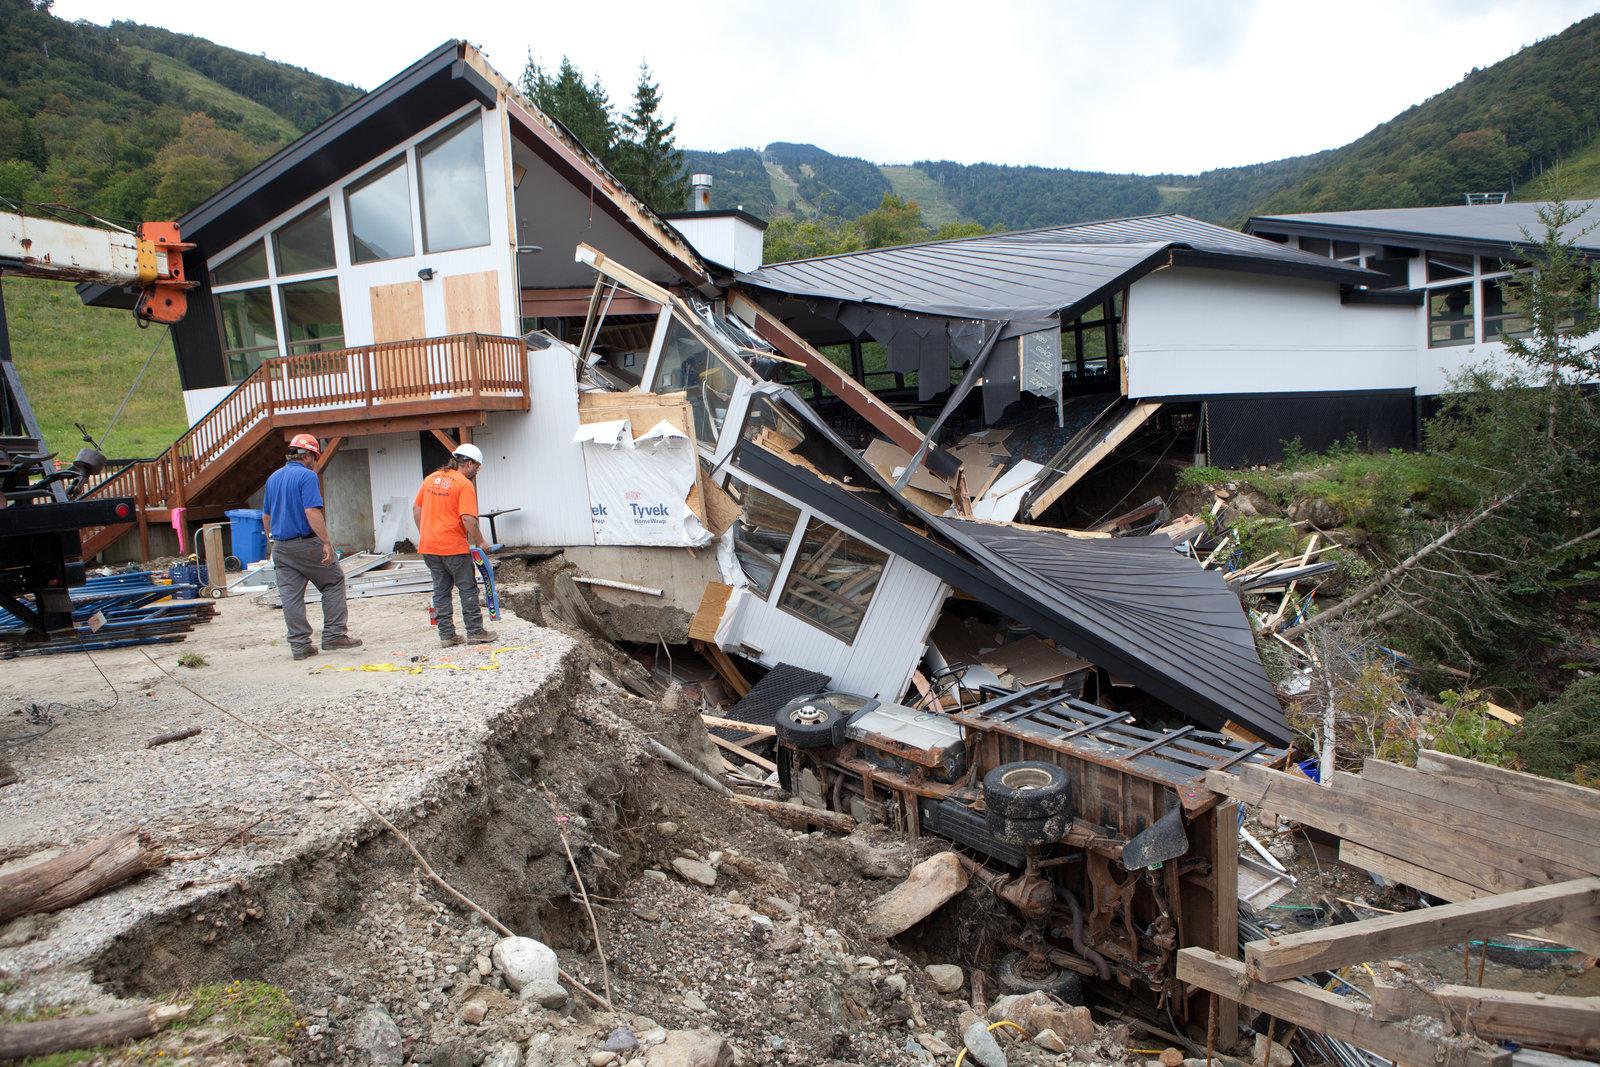 Massive flooding from Tropical Storm Irene left Vermont reeling